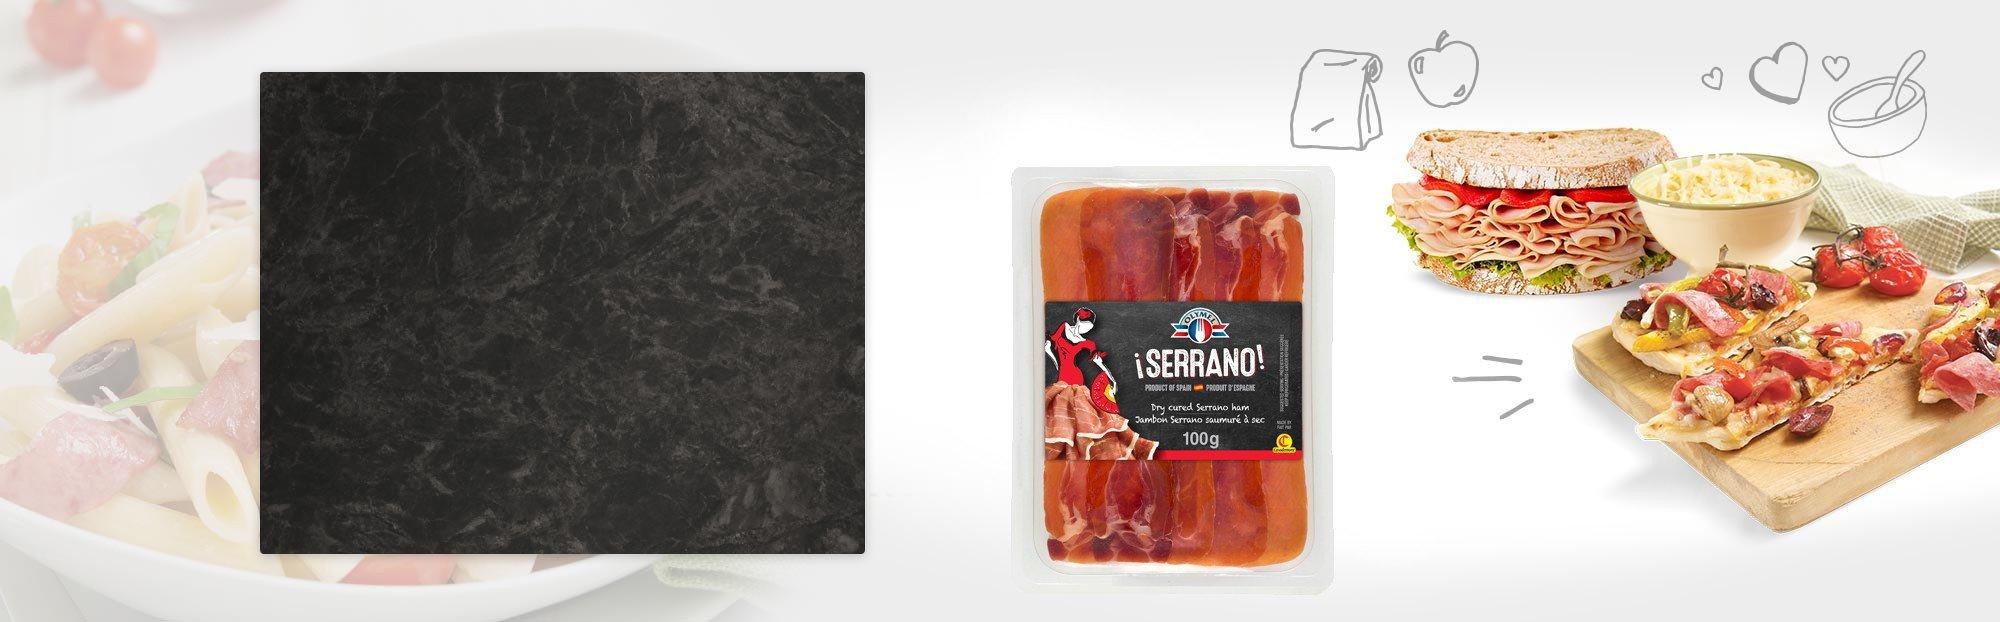 Serrano Dry Cured Serrano Ham